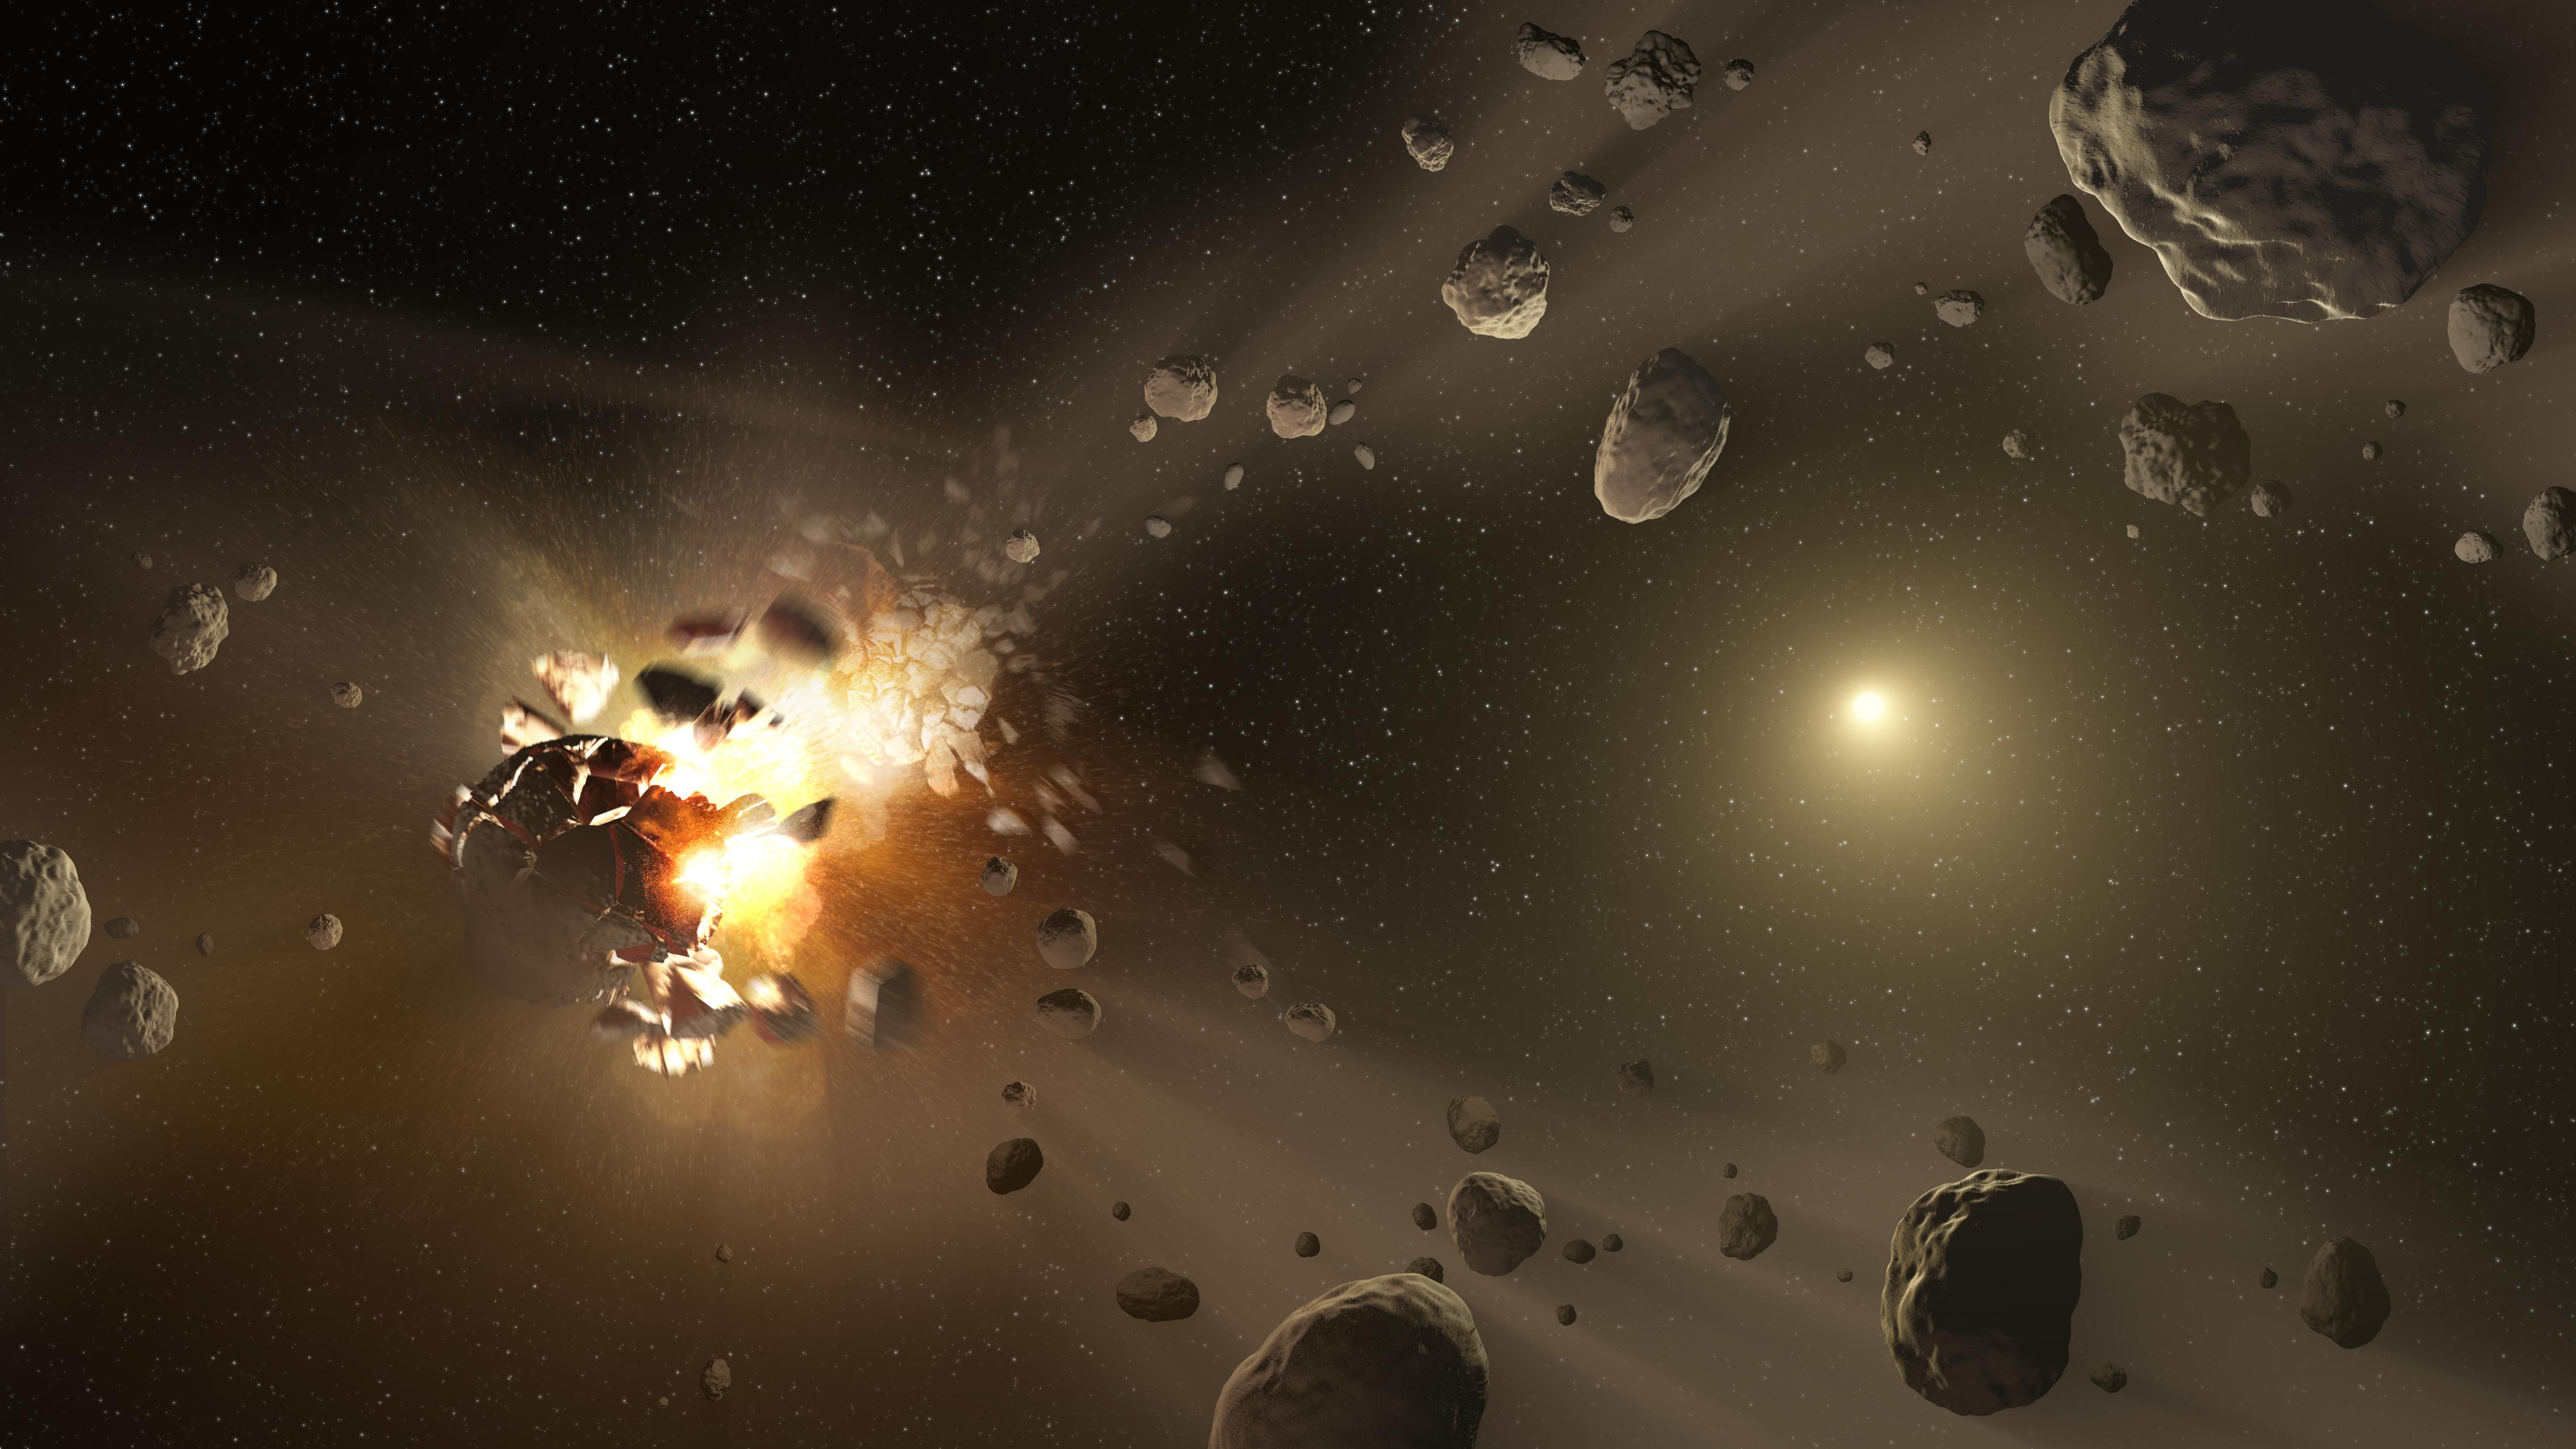 Exploding space rocks